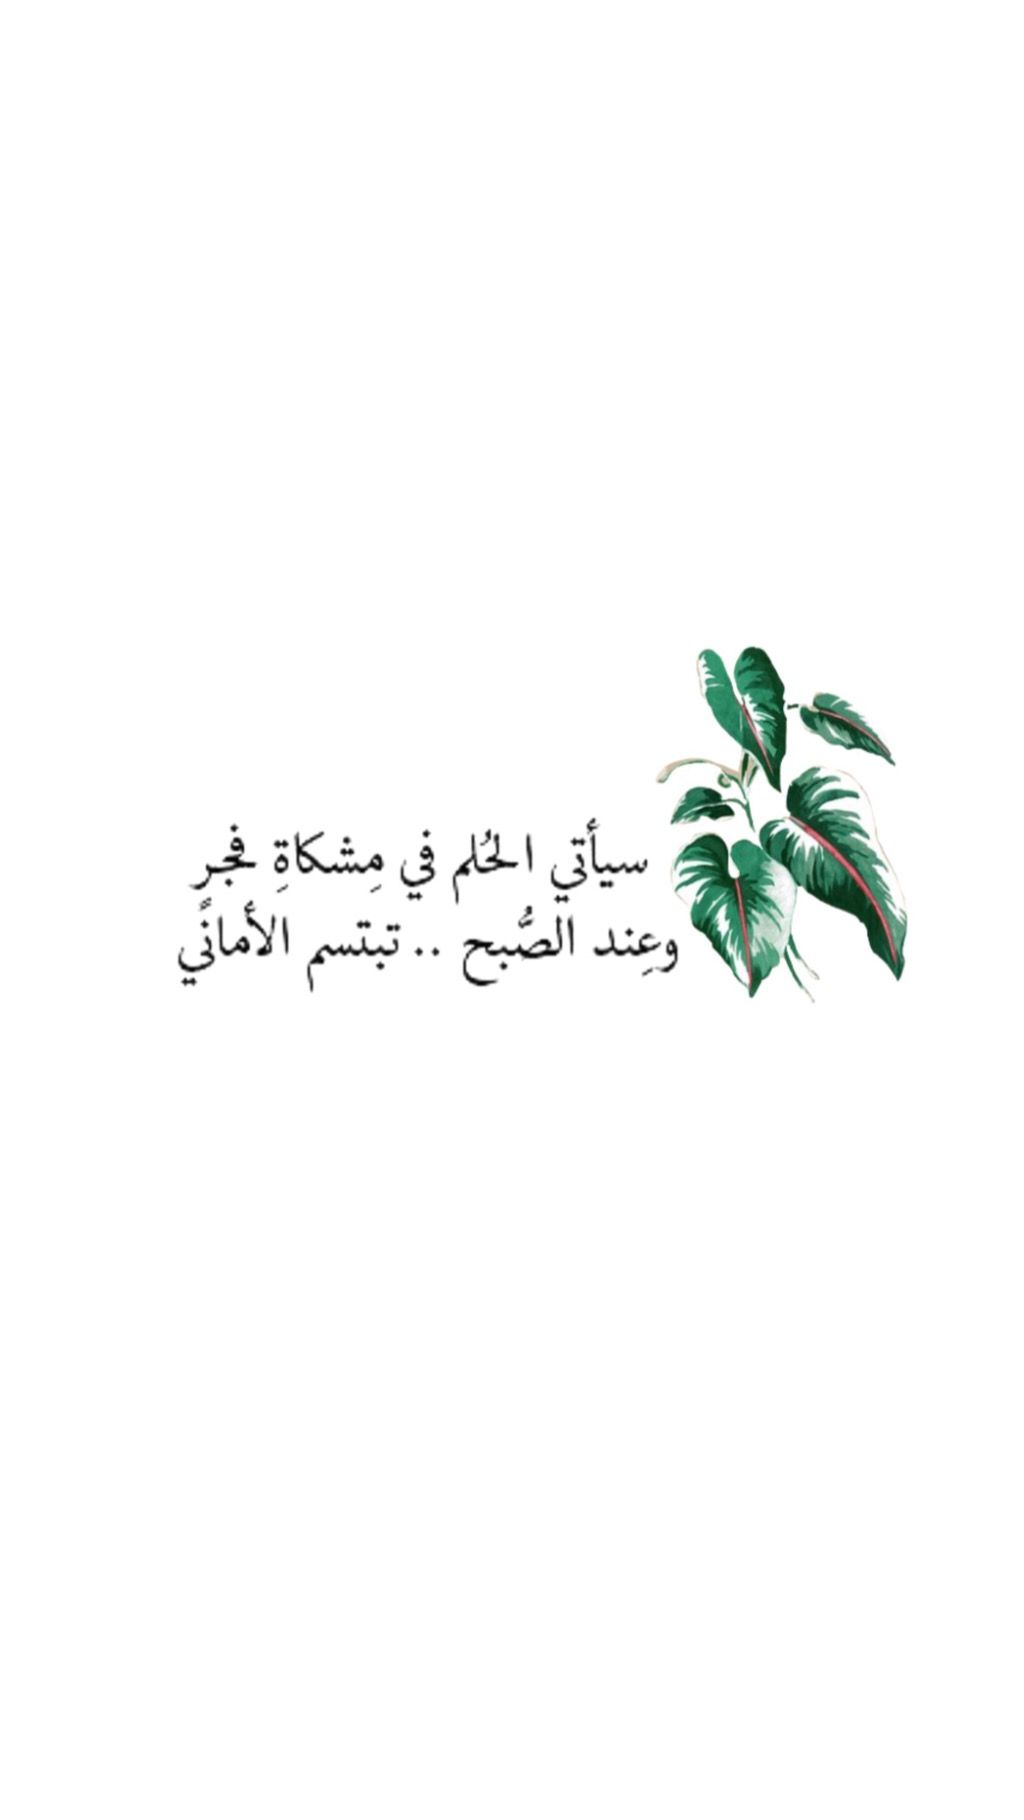 اقتباسات الفجر الصباح Wisdom Quotes Life Short Quotes Love Quote Symbol